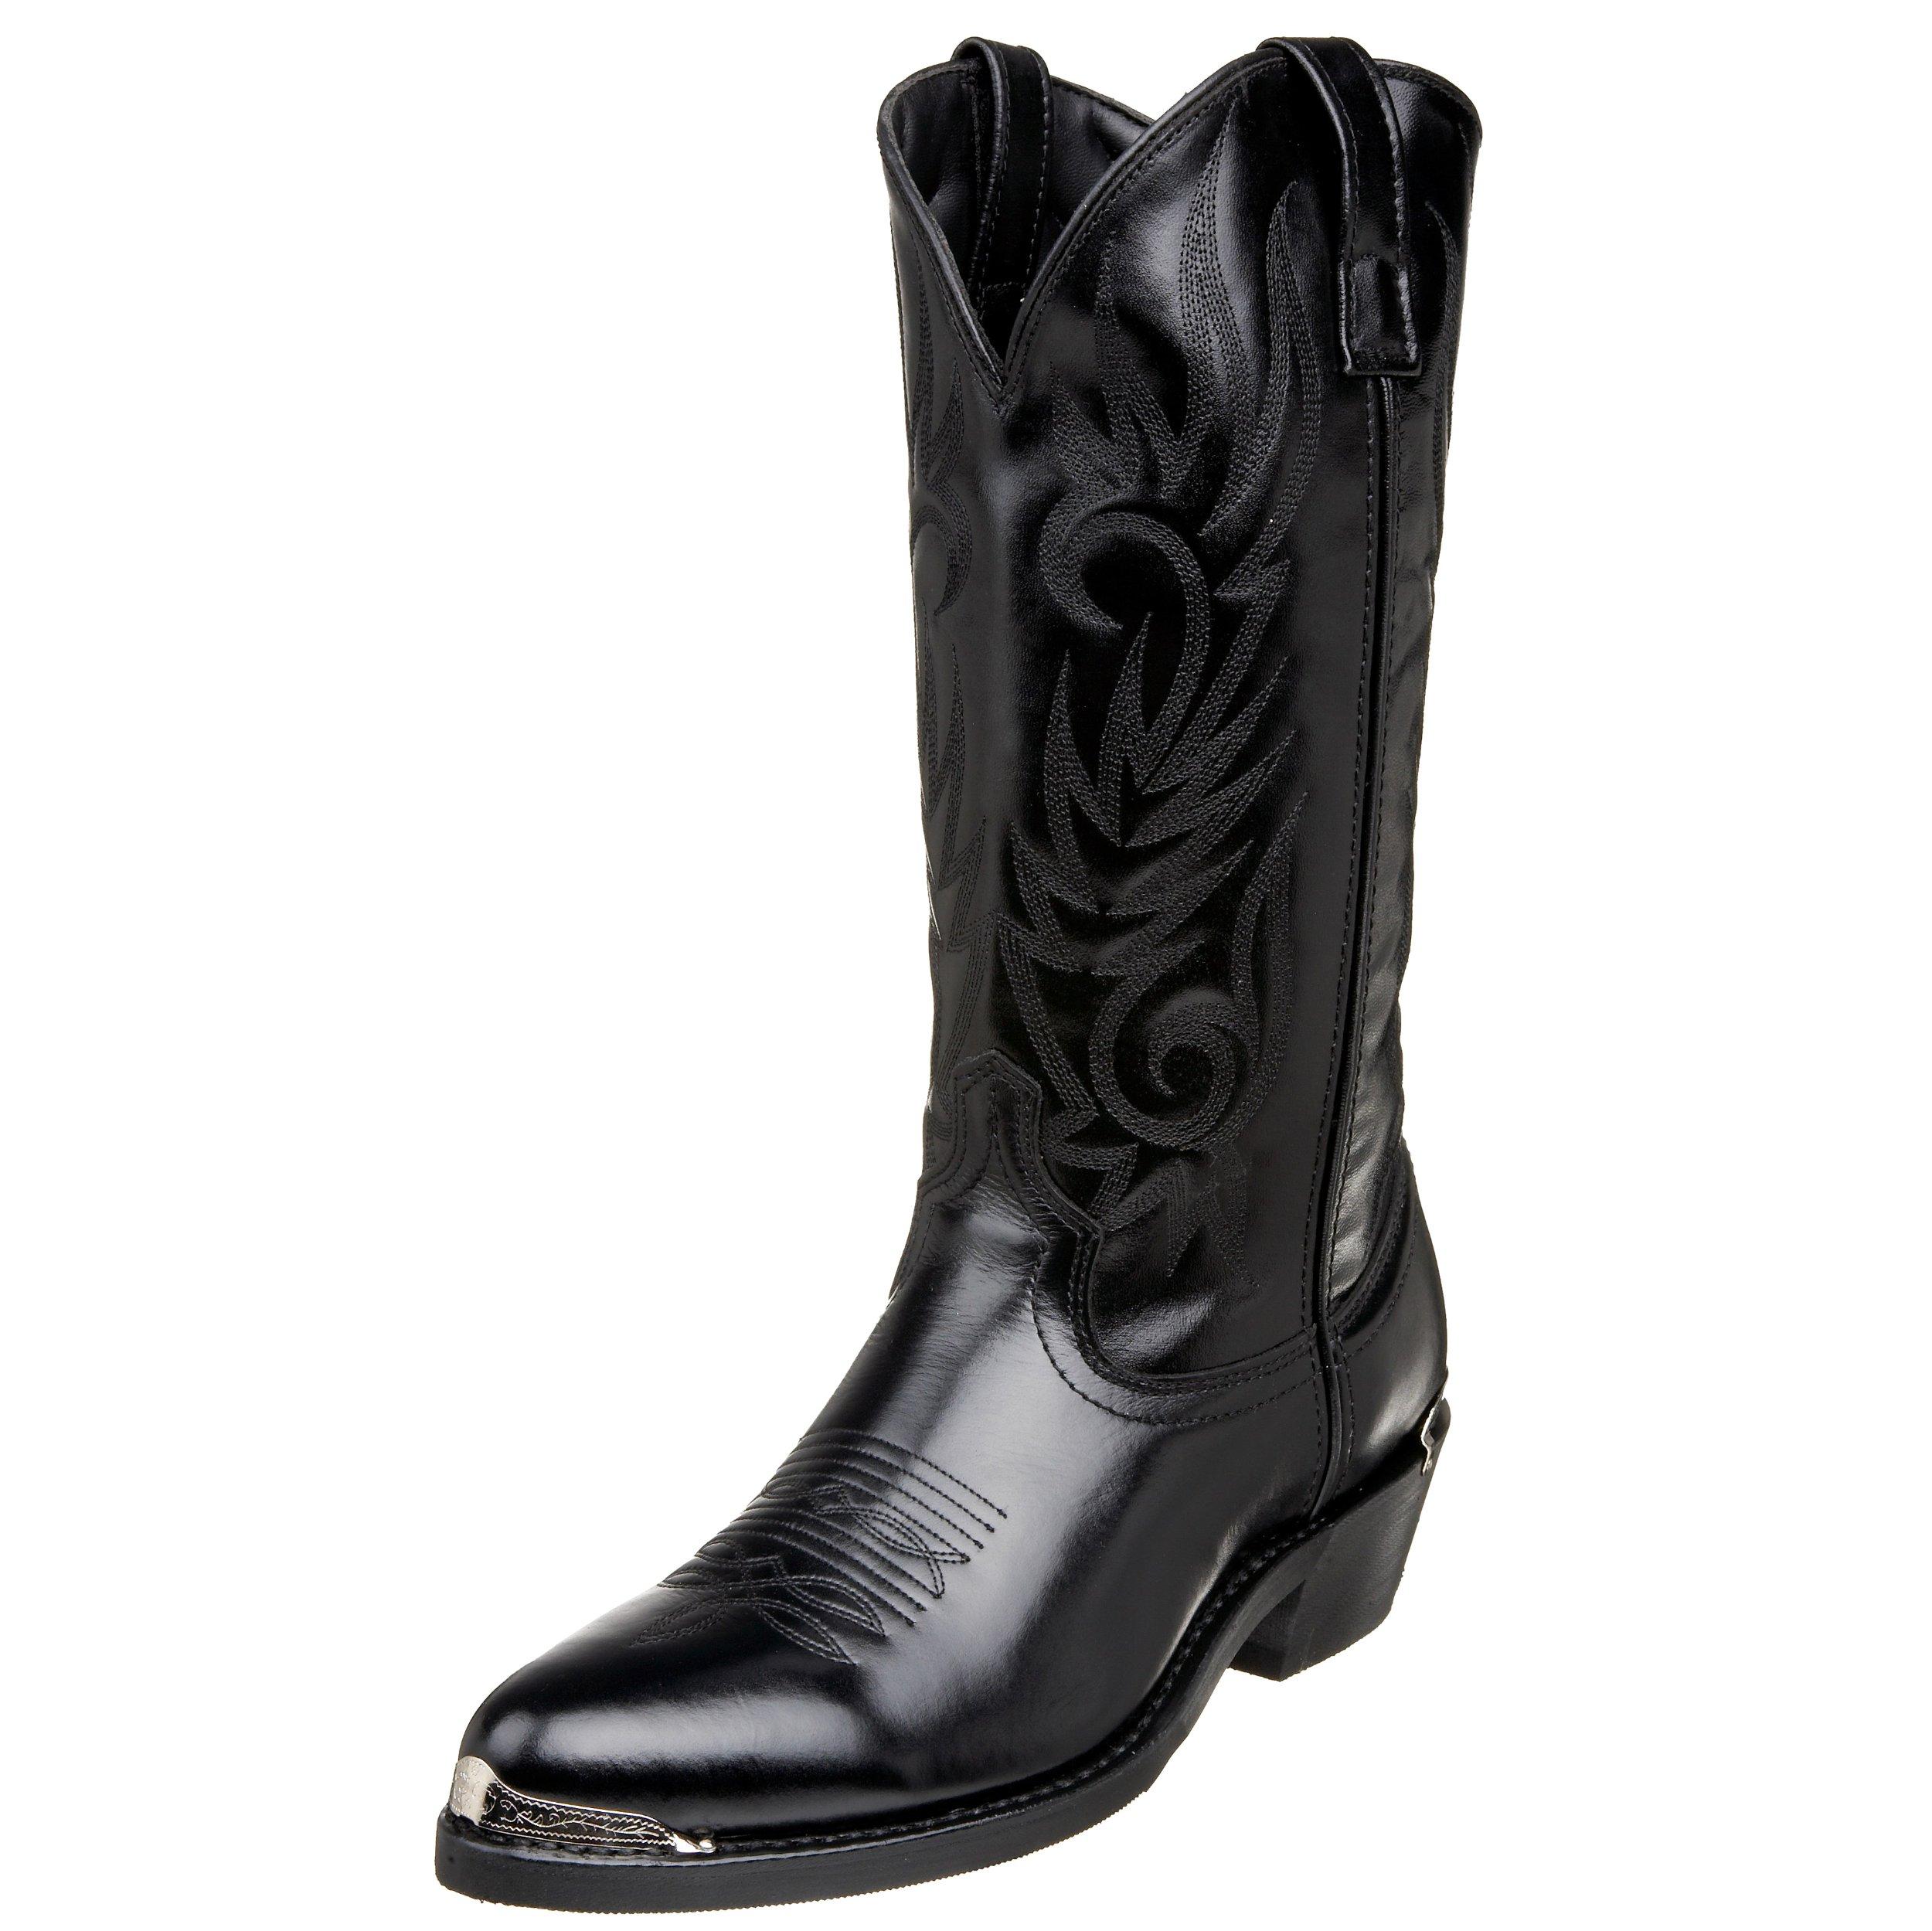 Laredo Men's Mccomb Western Boot,Black,13 D US